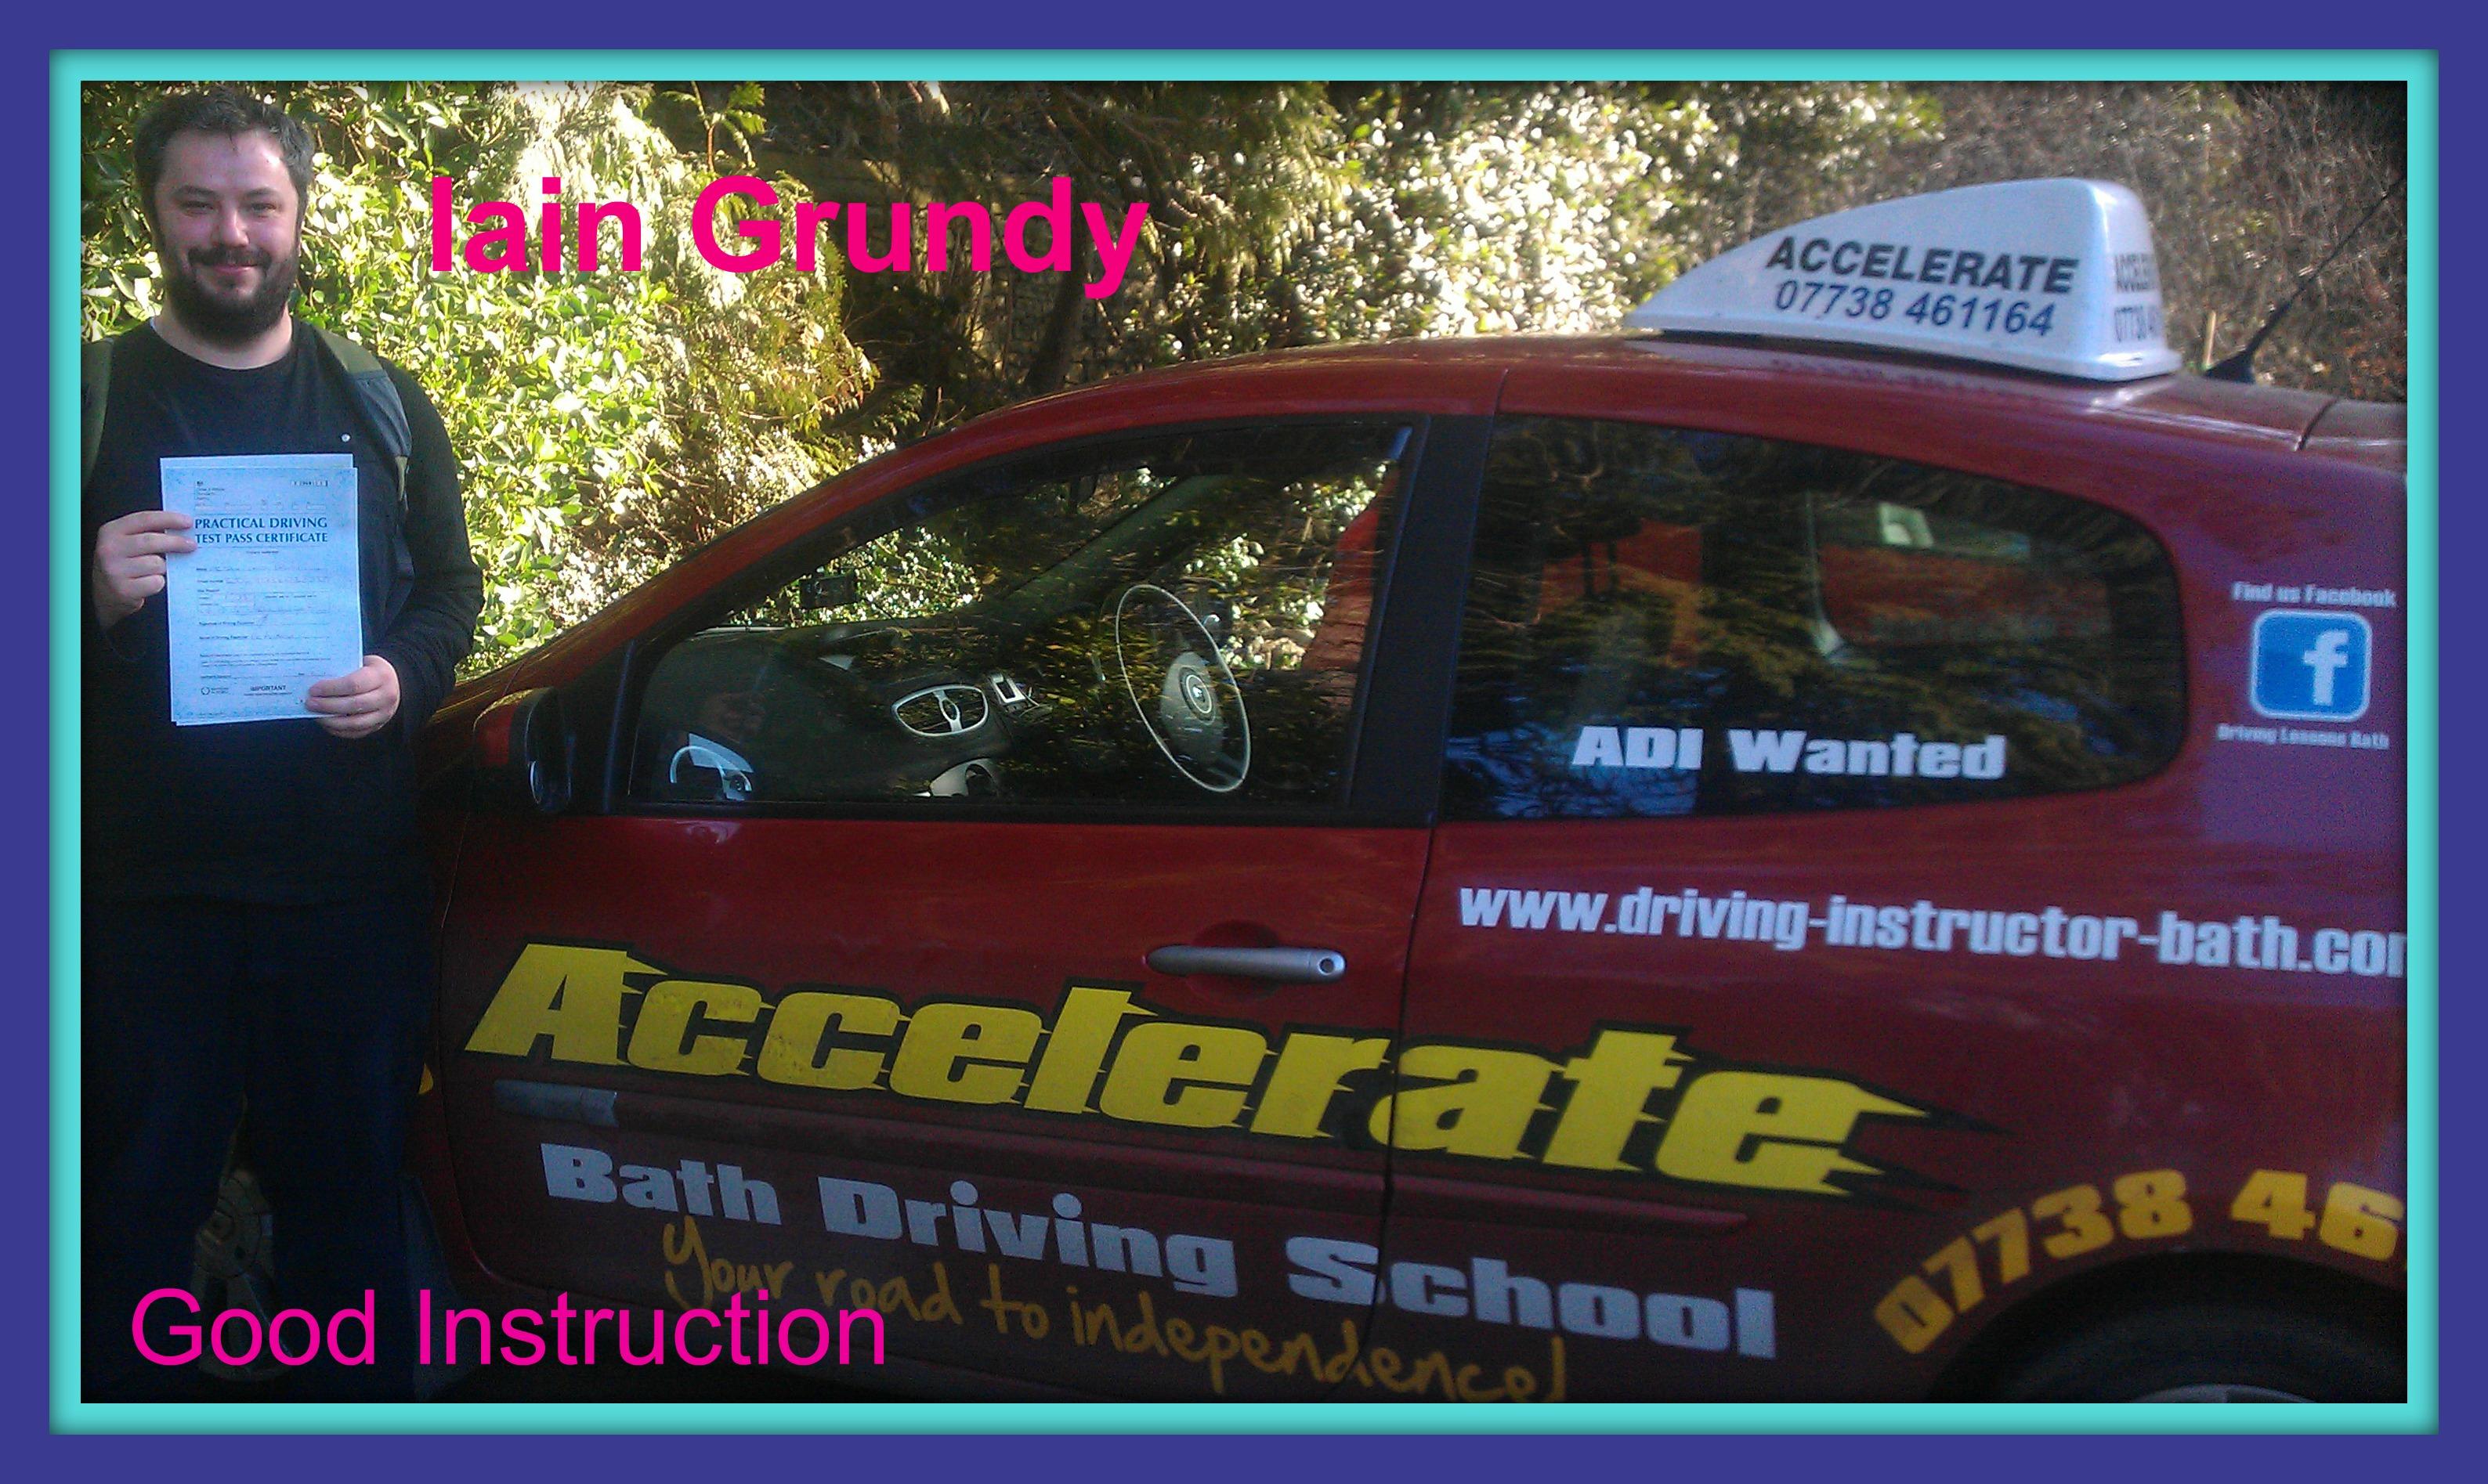 driving Instructors bath accelerate driving school